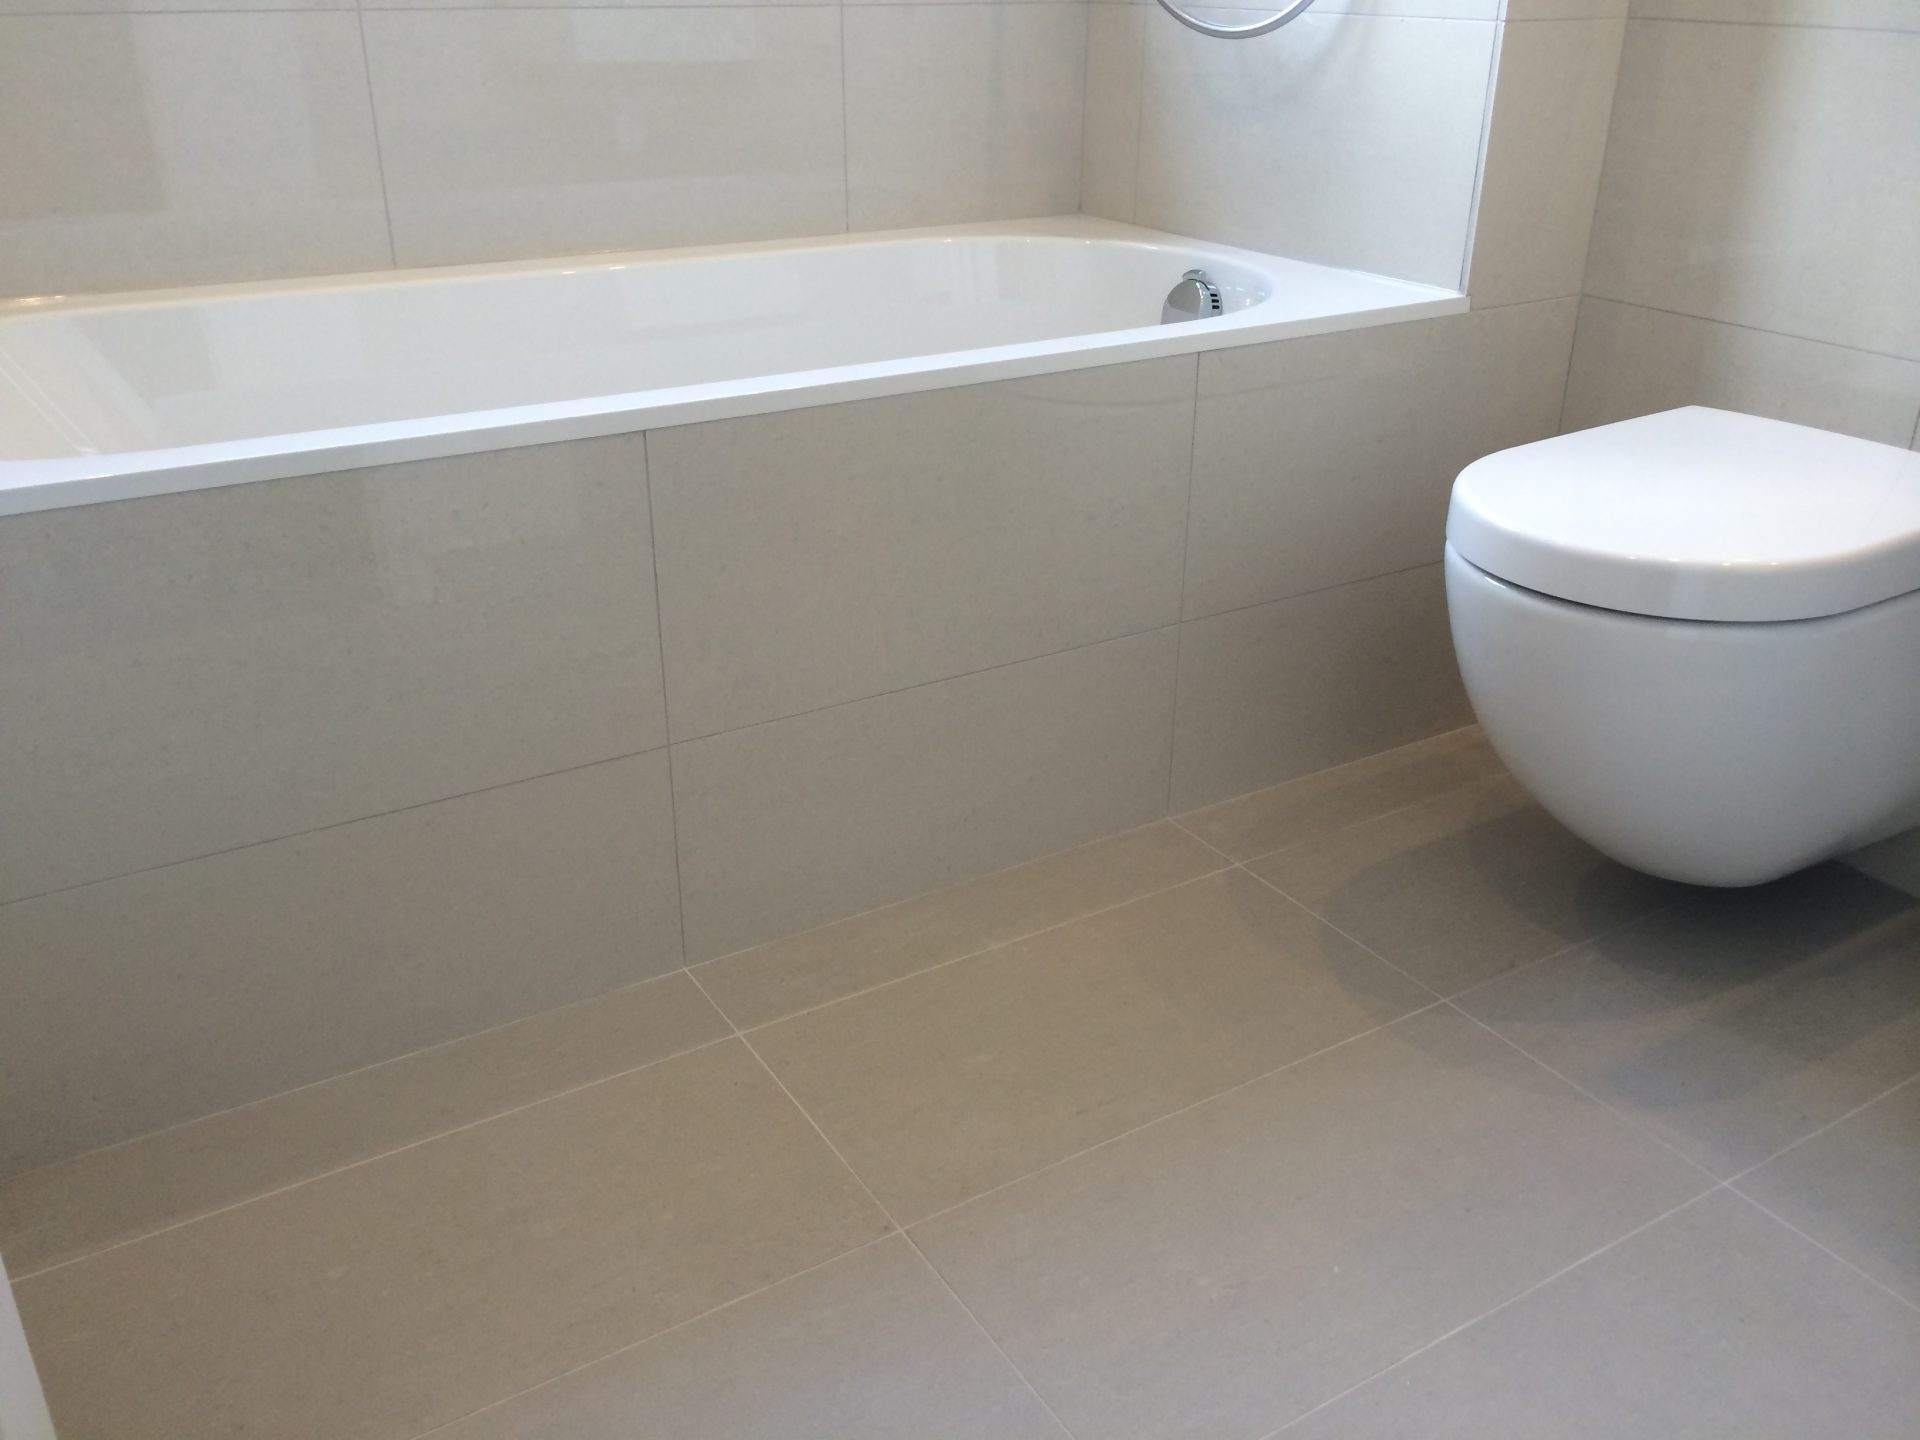 Bathroom Refit Ecoflo UK Kitchens Bathrooms UK Bedford St - Bathroom refit